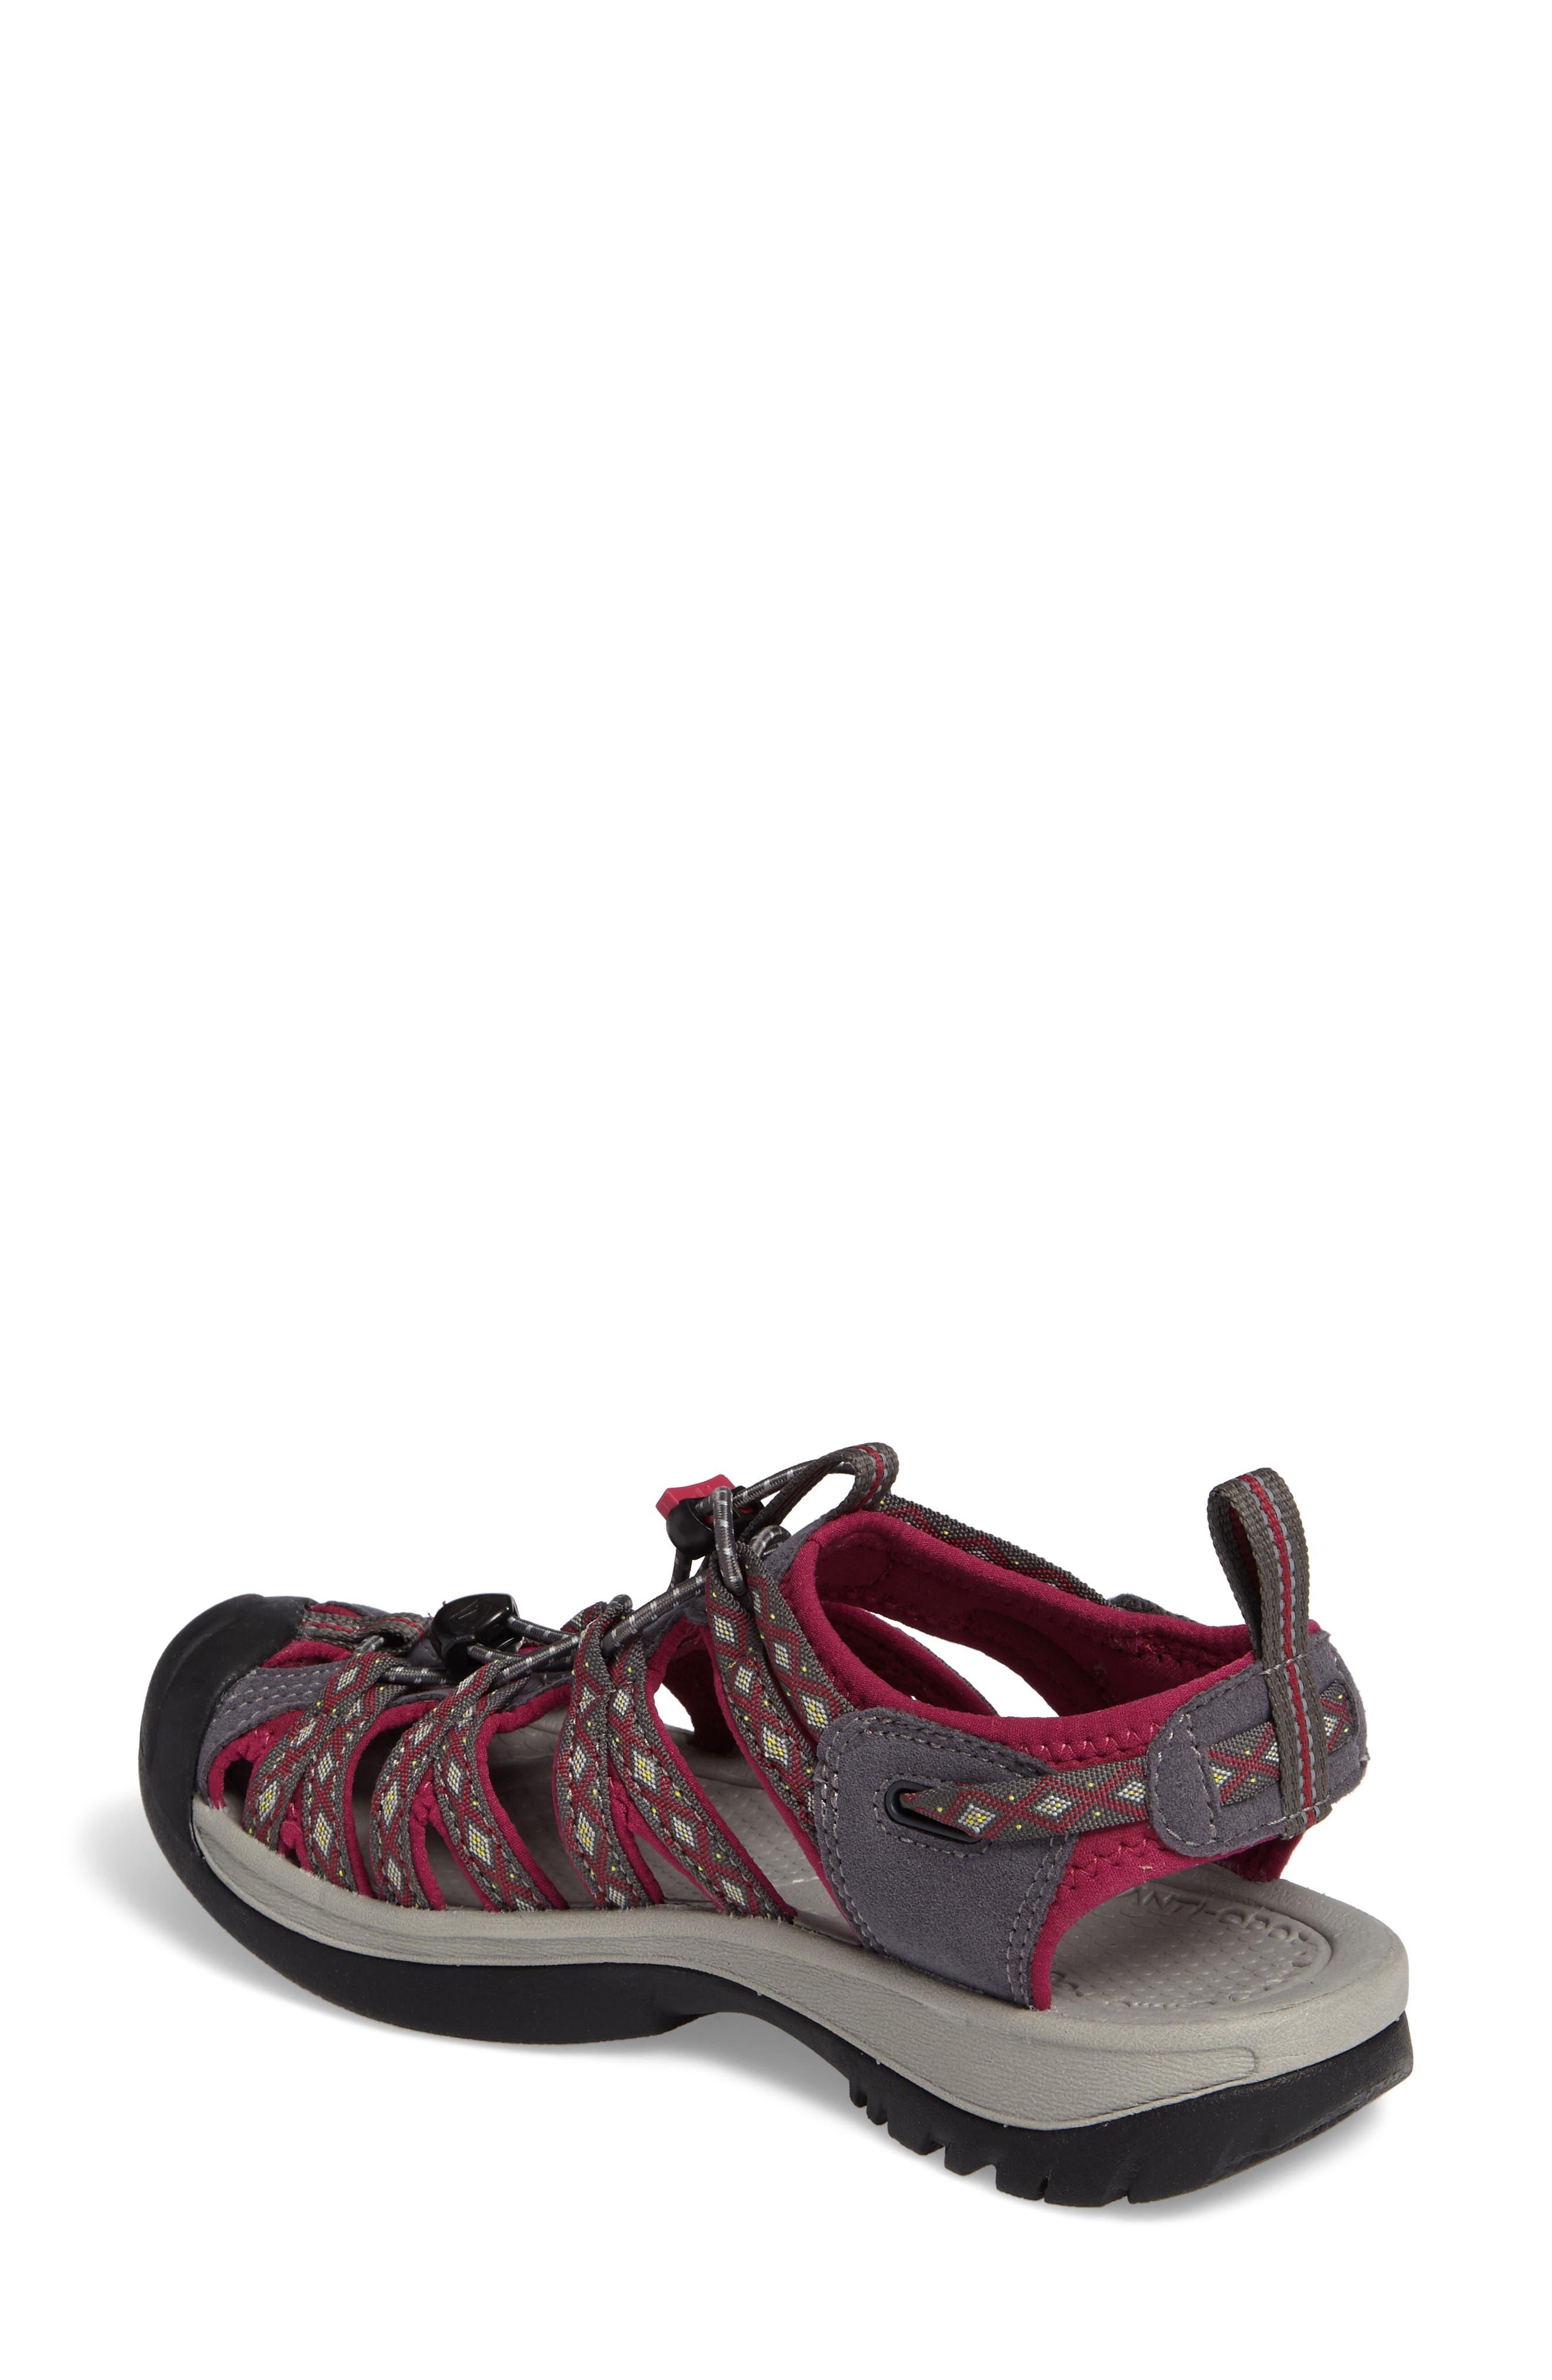 Alternate Image 2  - Keen 'Whisper' Water Friendly Sport Sandal (Women)